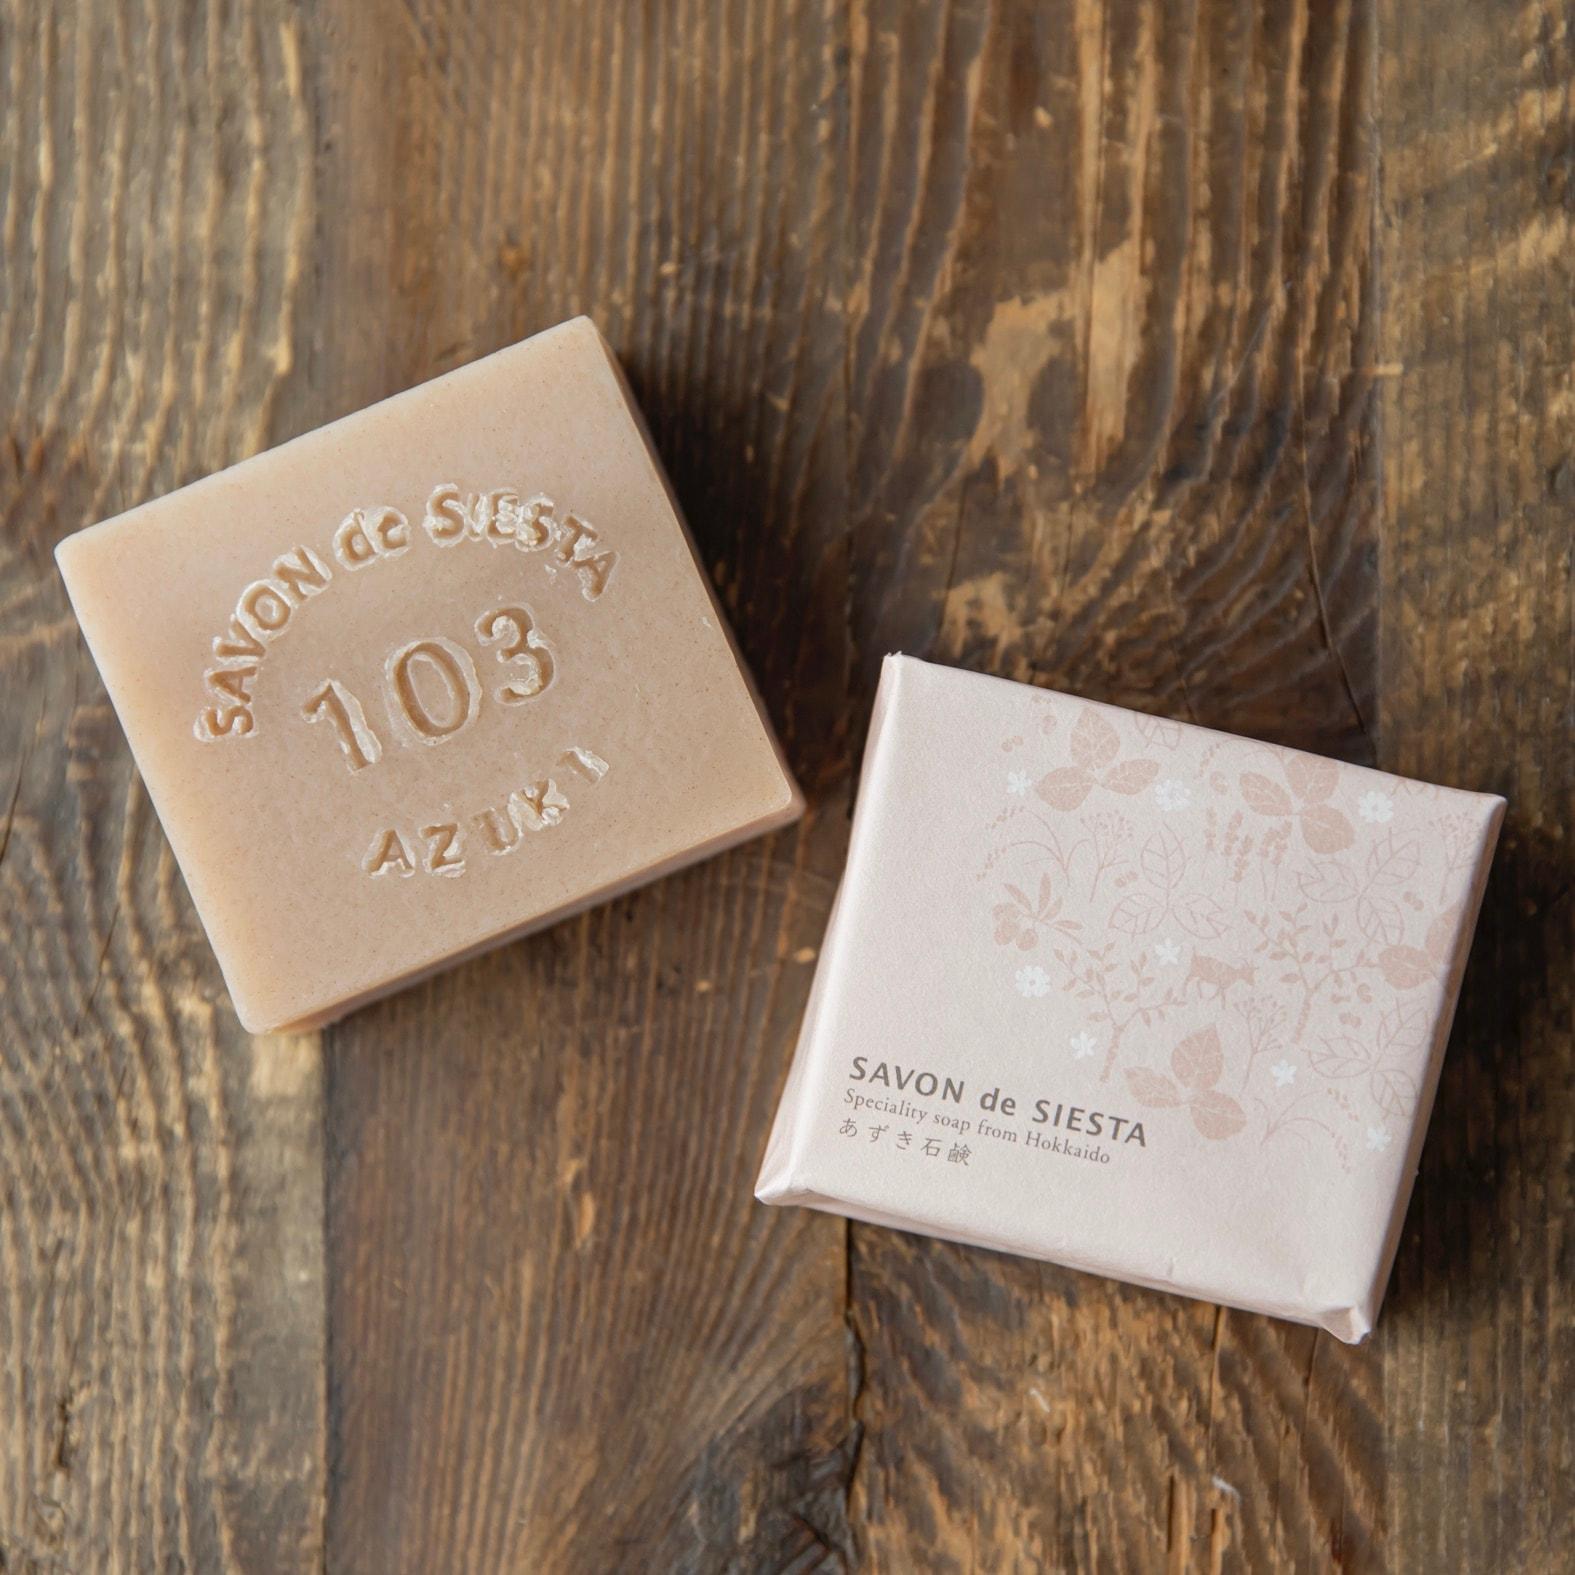 SAVON de SIESTA(サボンデシエスタ)のあずき石鹸,コールドプロセス製法で作られた天然素材の石けん